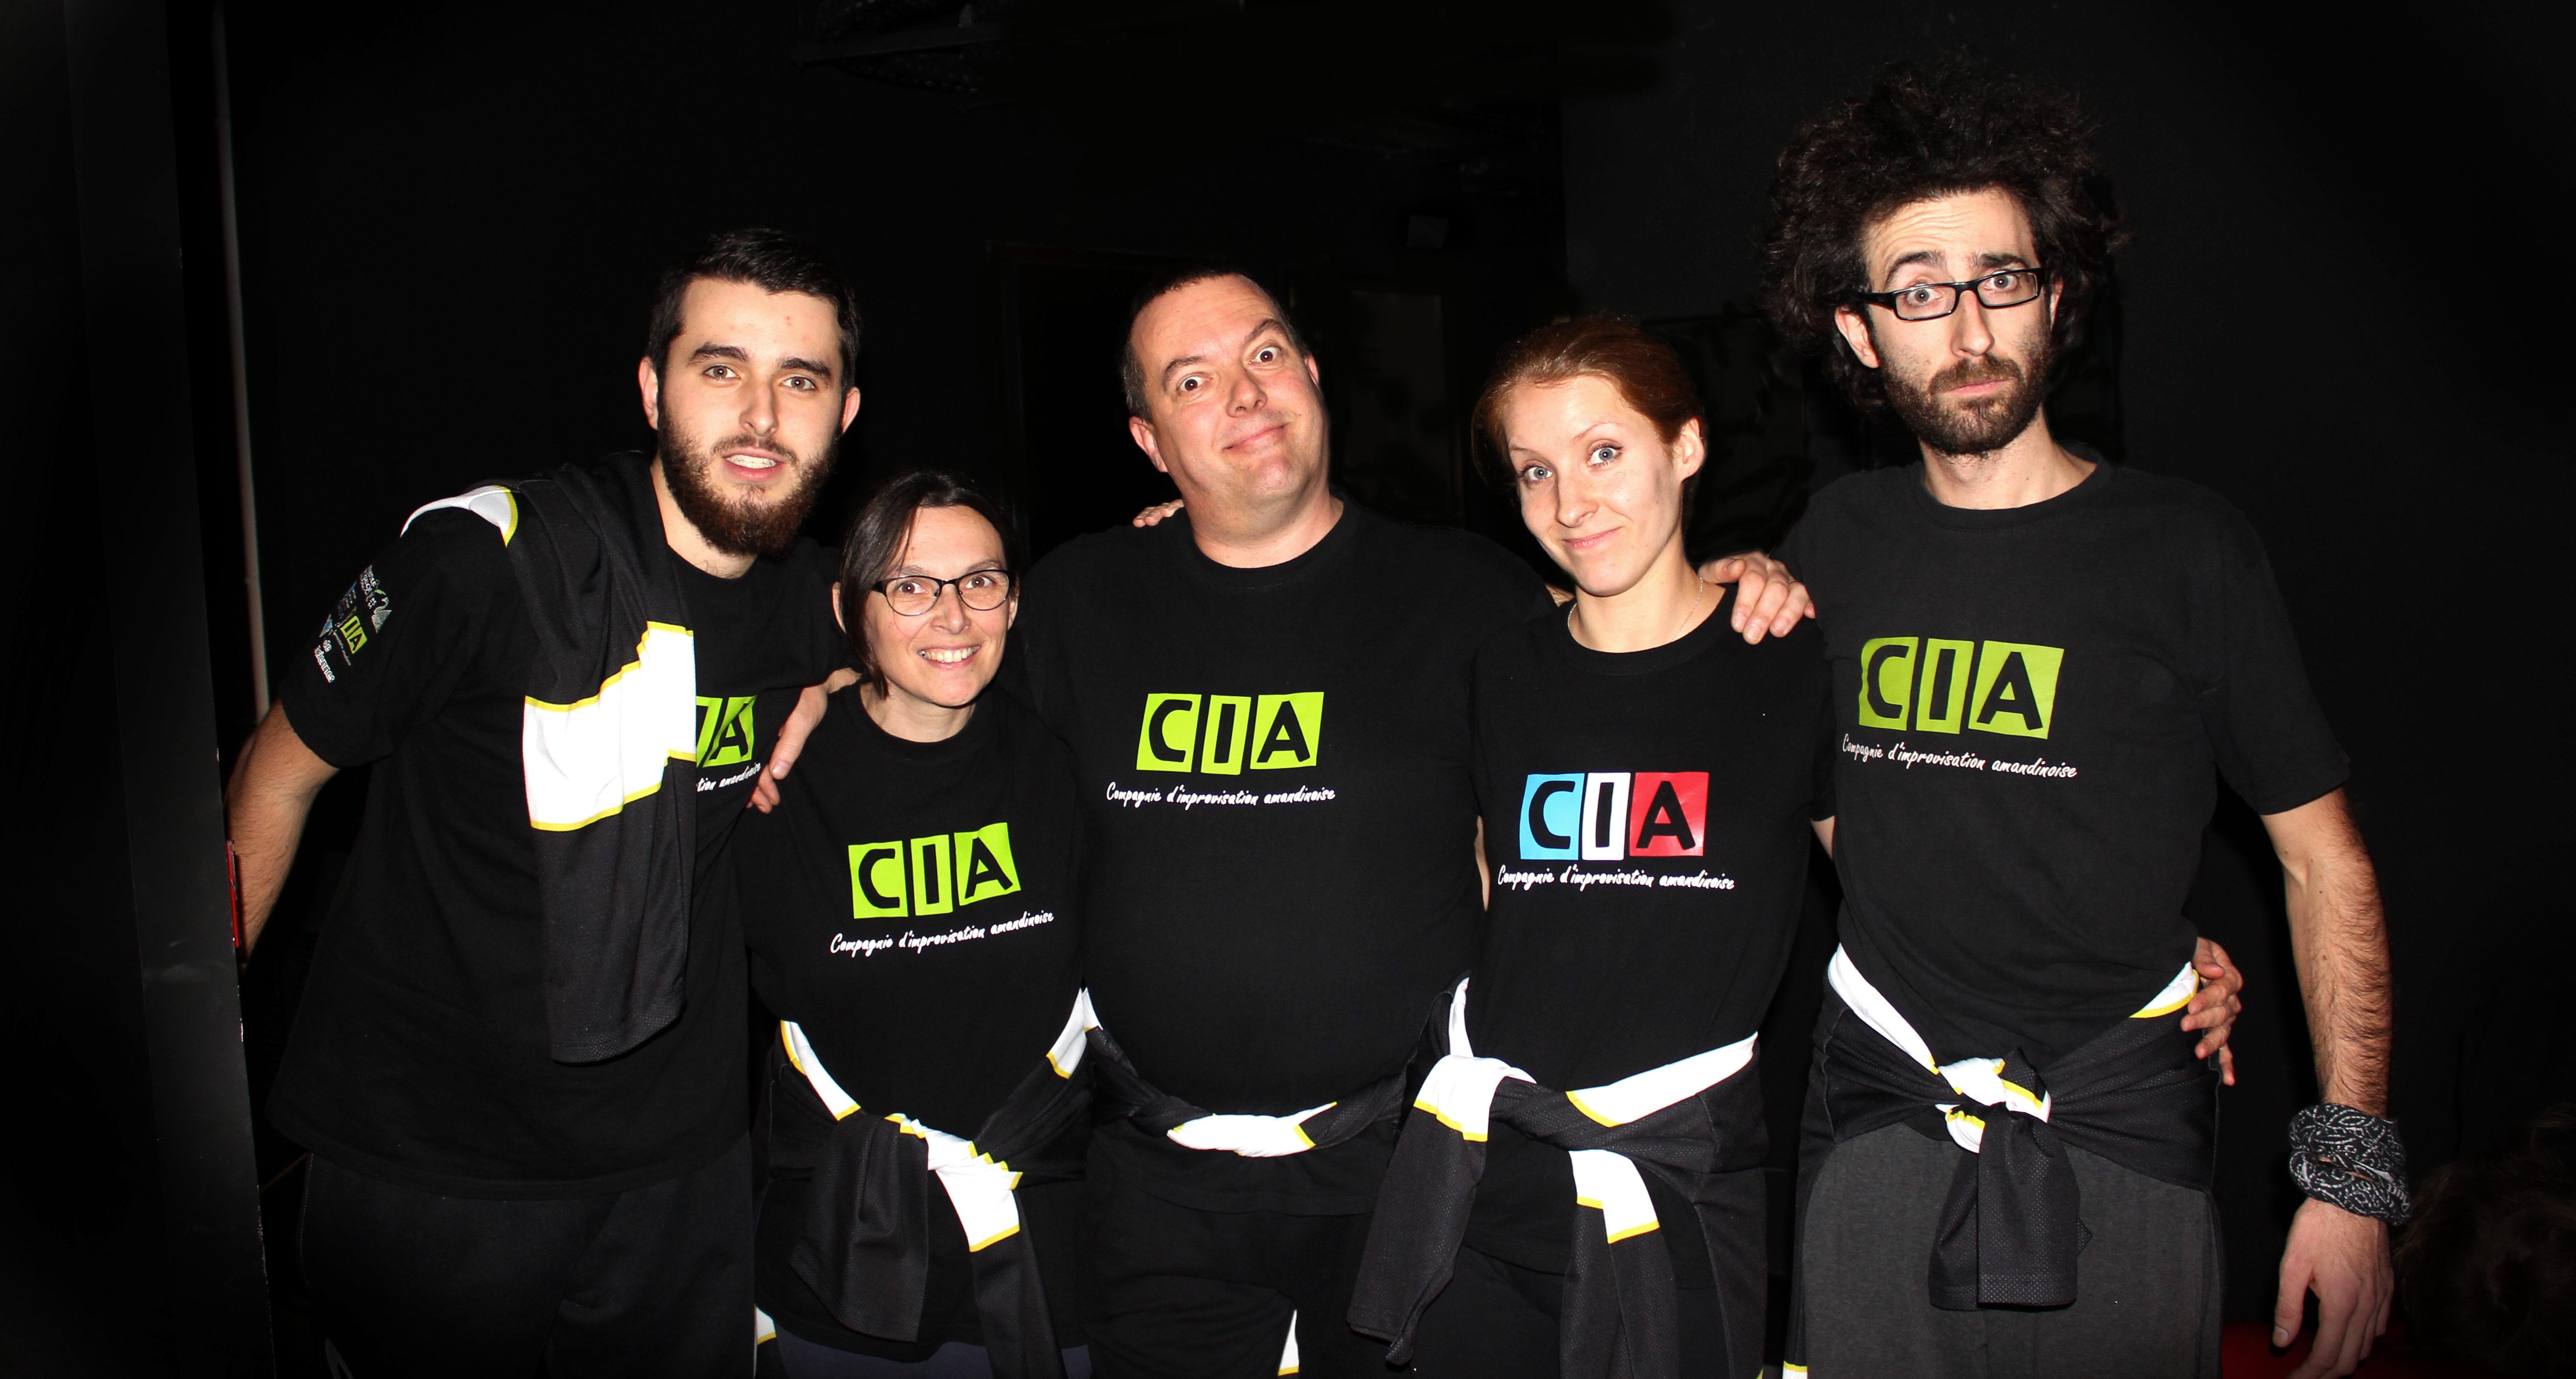 Team CIA